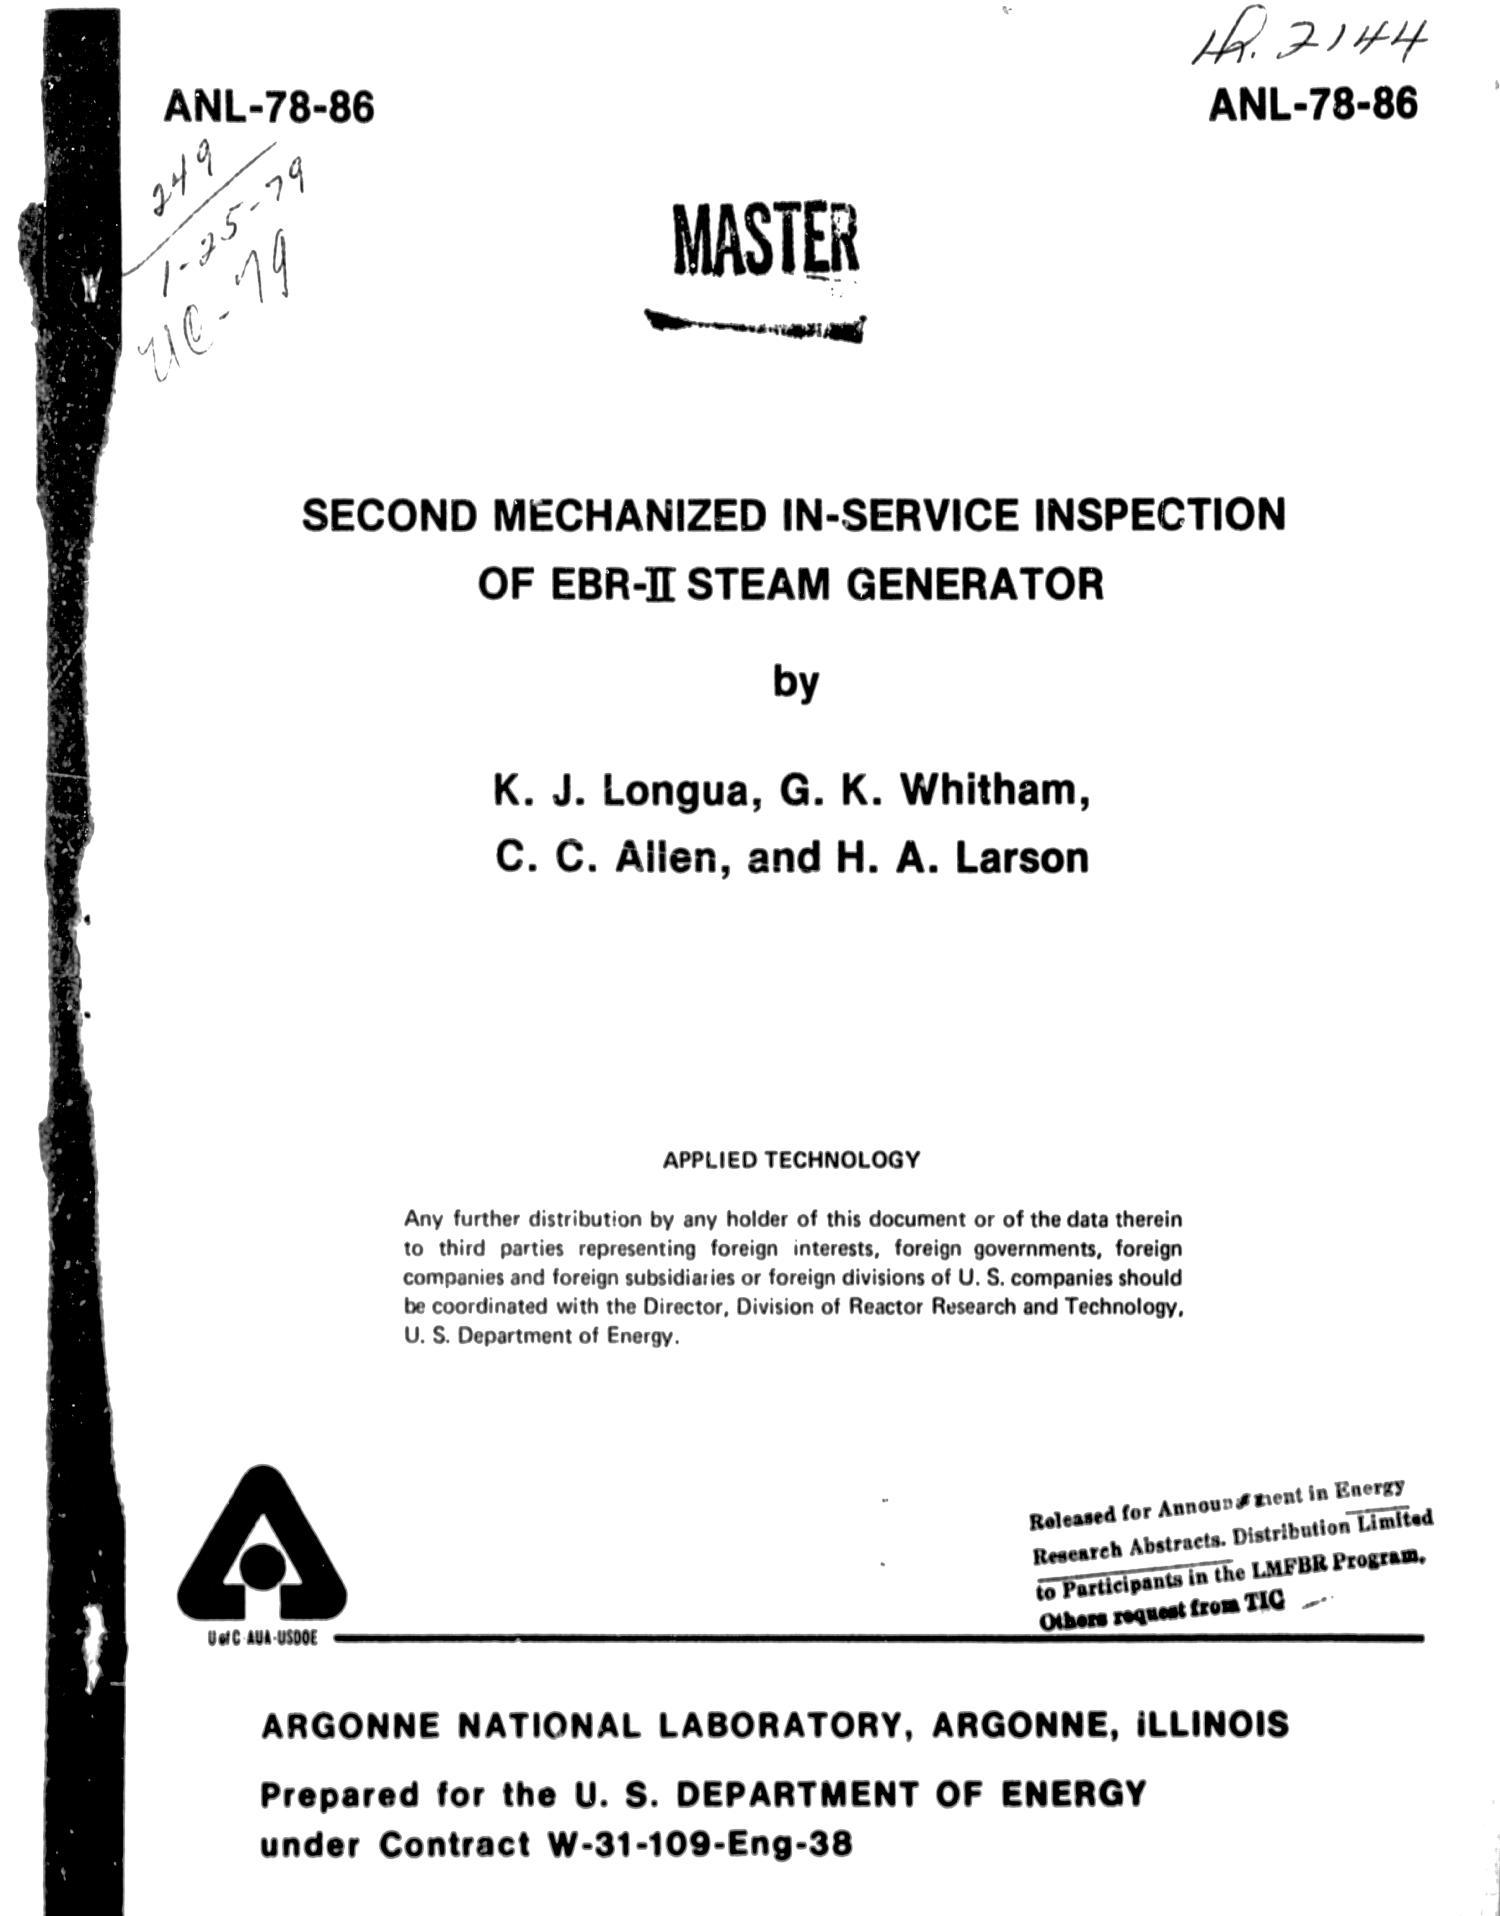 Second Mechanized In Service Inspection of EBR 2 Steam Generator